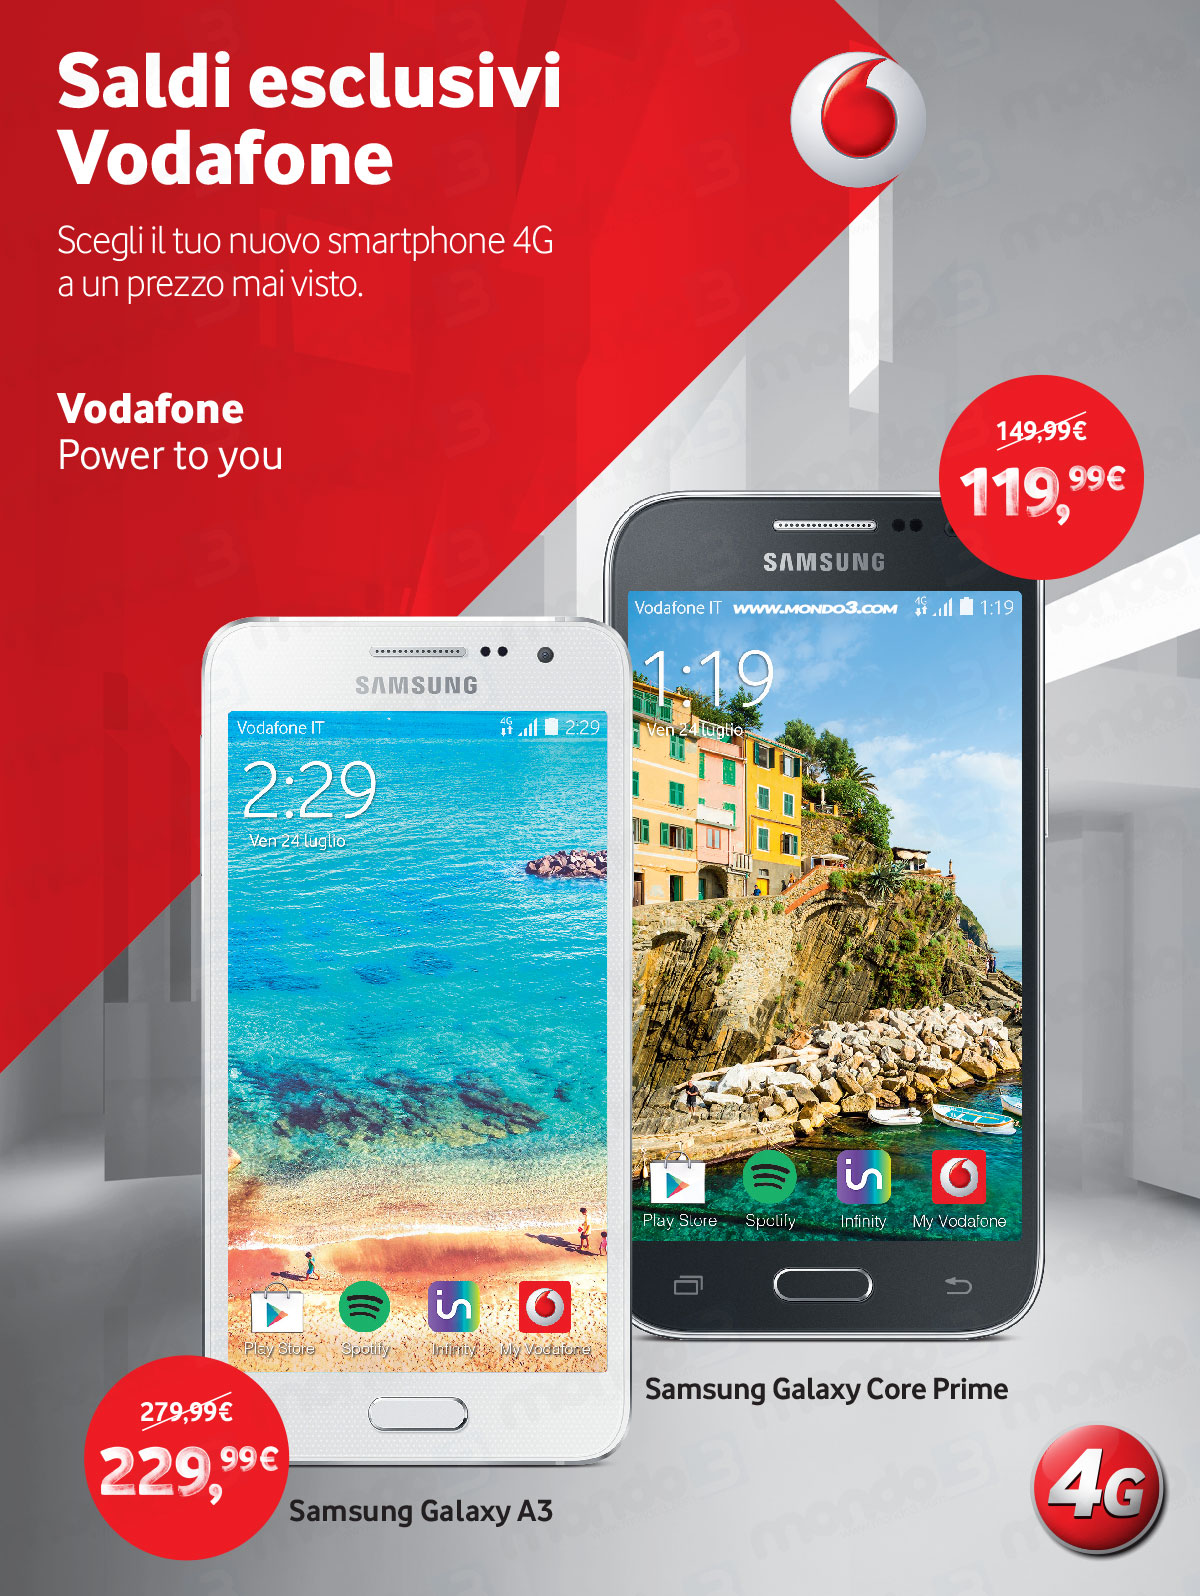 Saldi Vodafone estate 2015